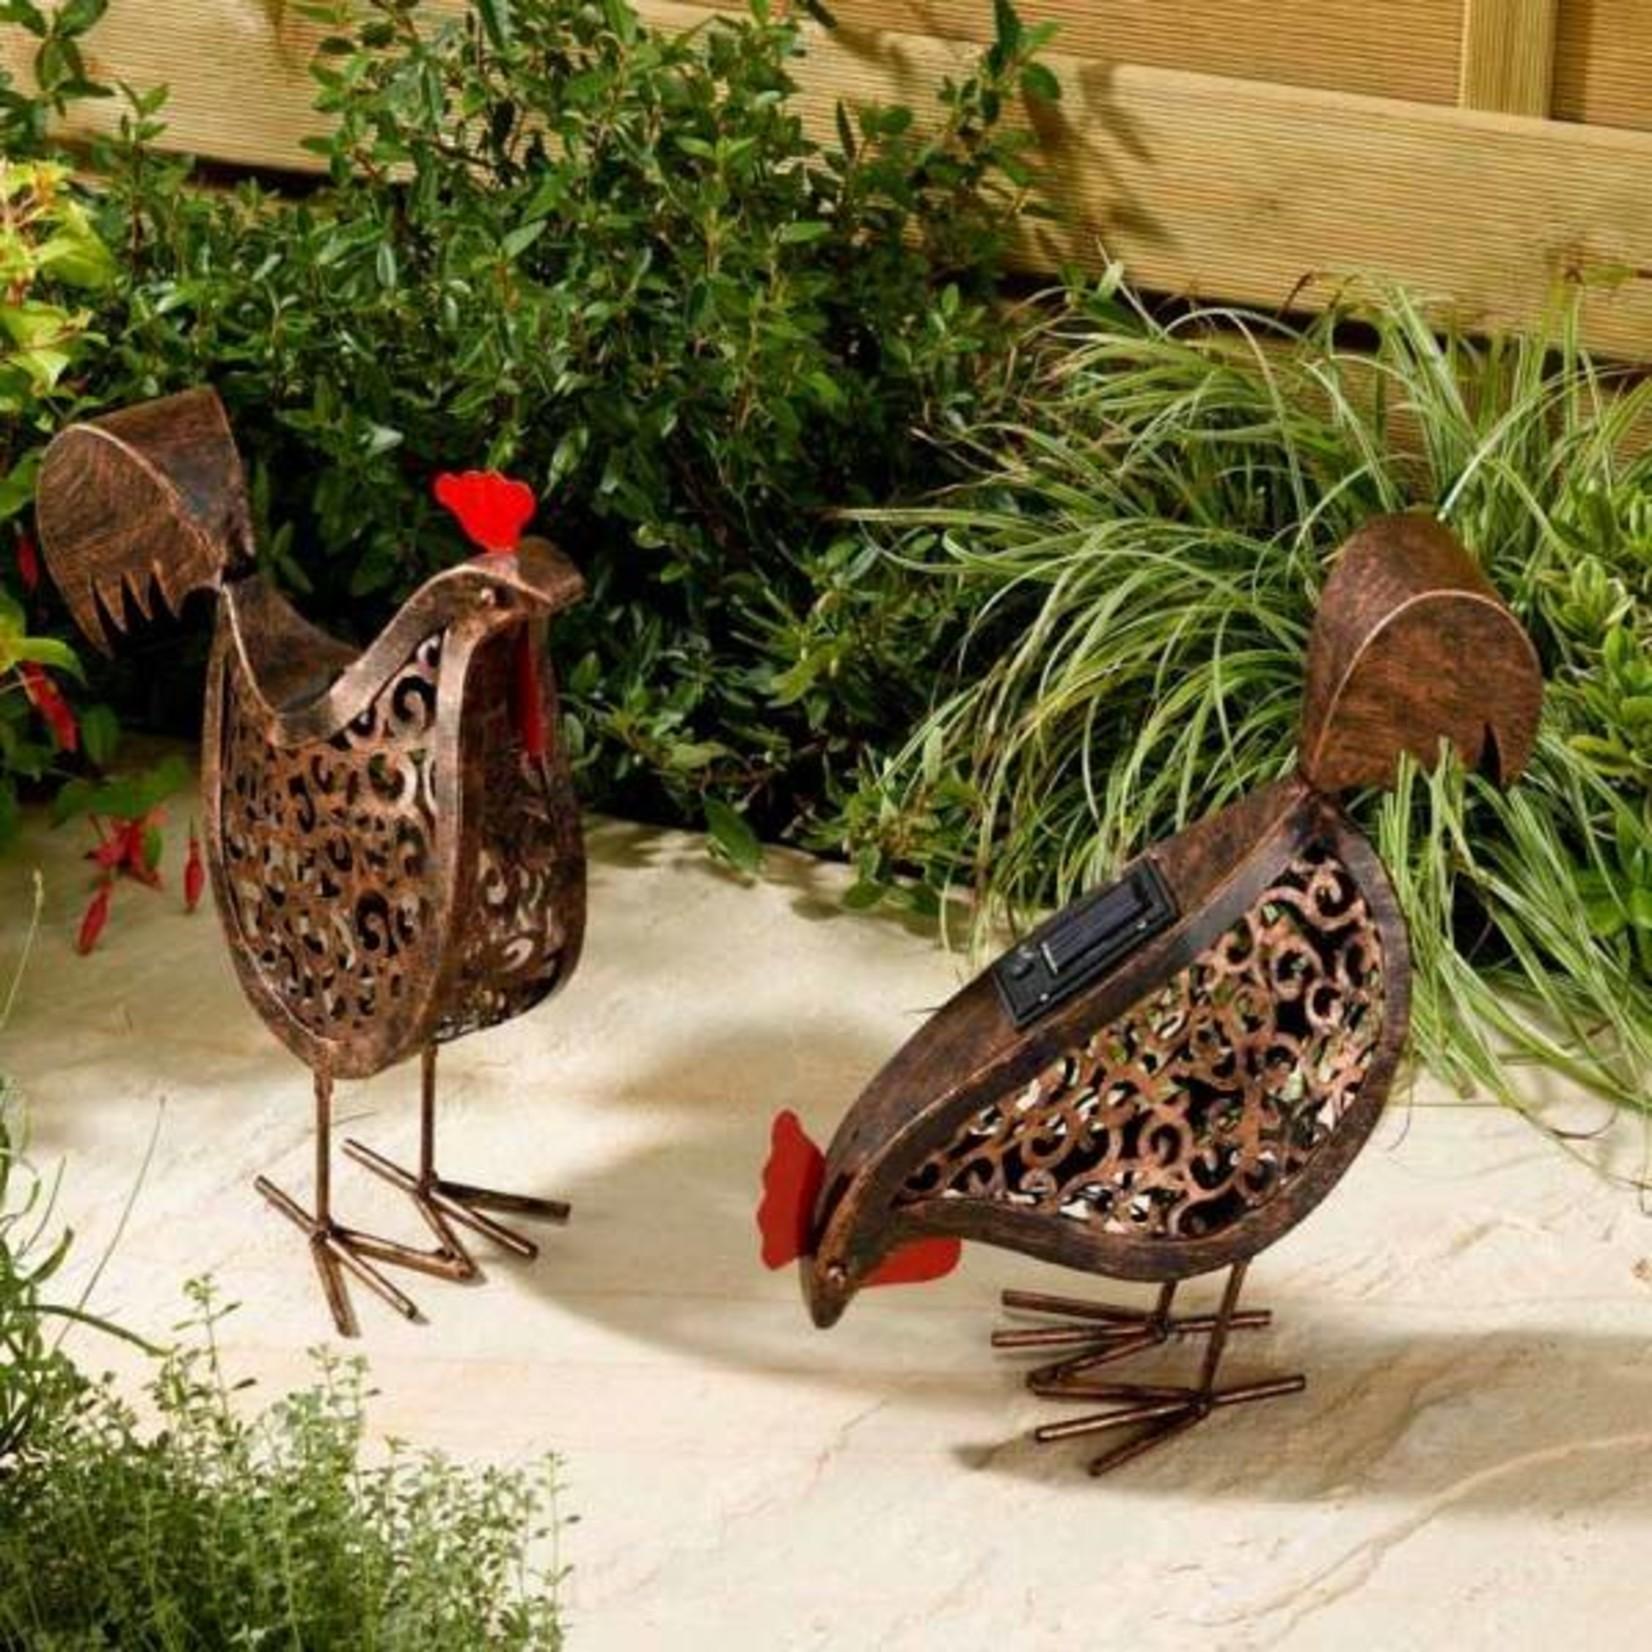 Smart Garden SMART GARDEN SOLAR SILHOUETTE HENS